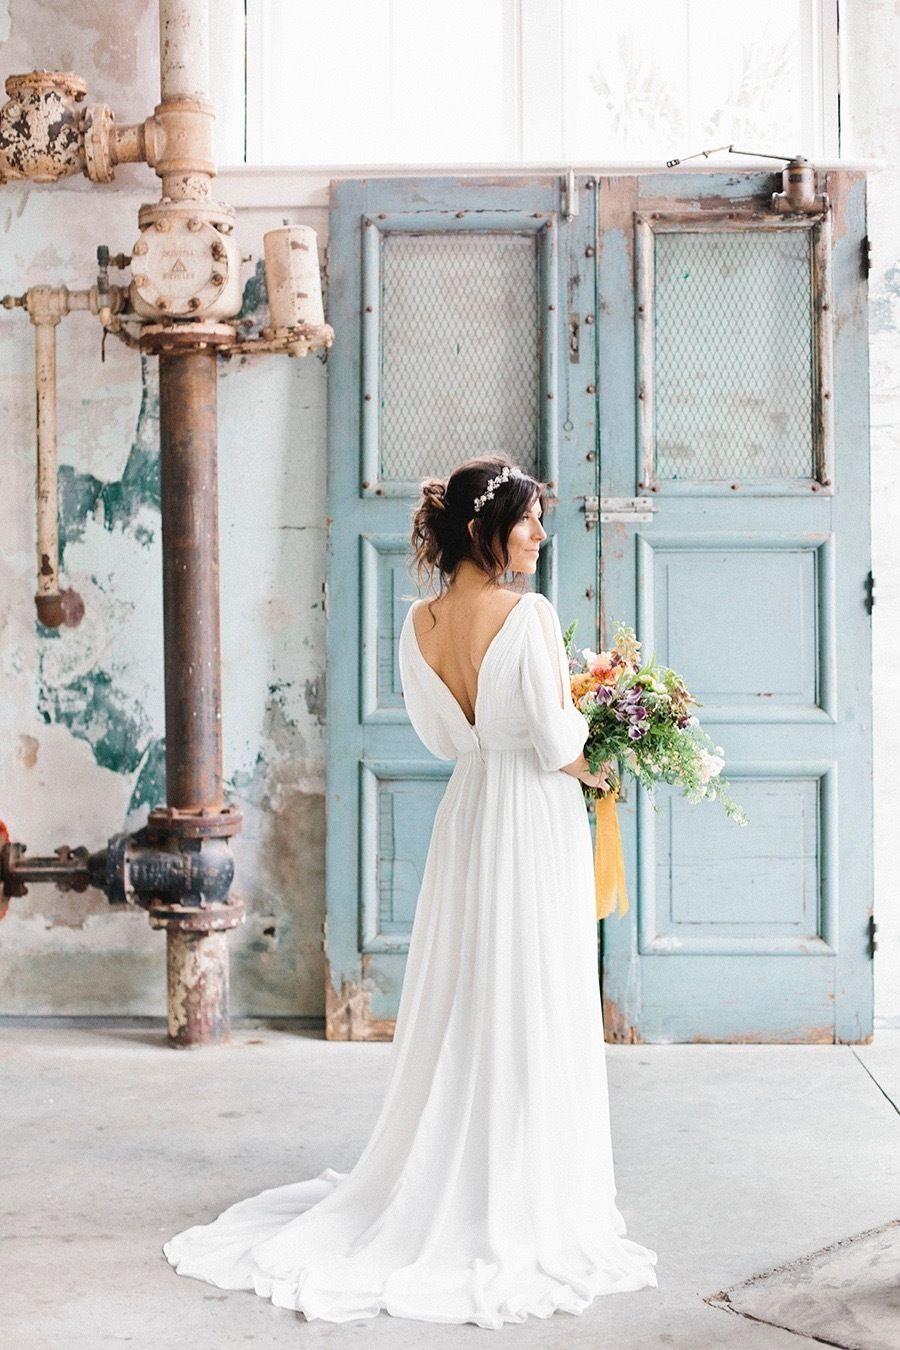 Best Wedding Dresses of 2015 | Wedding dress, Weddings and Wedding